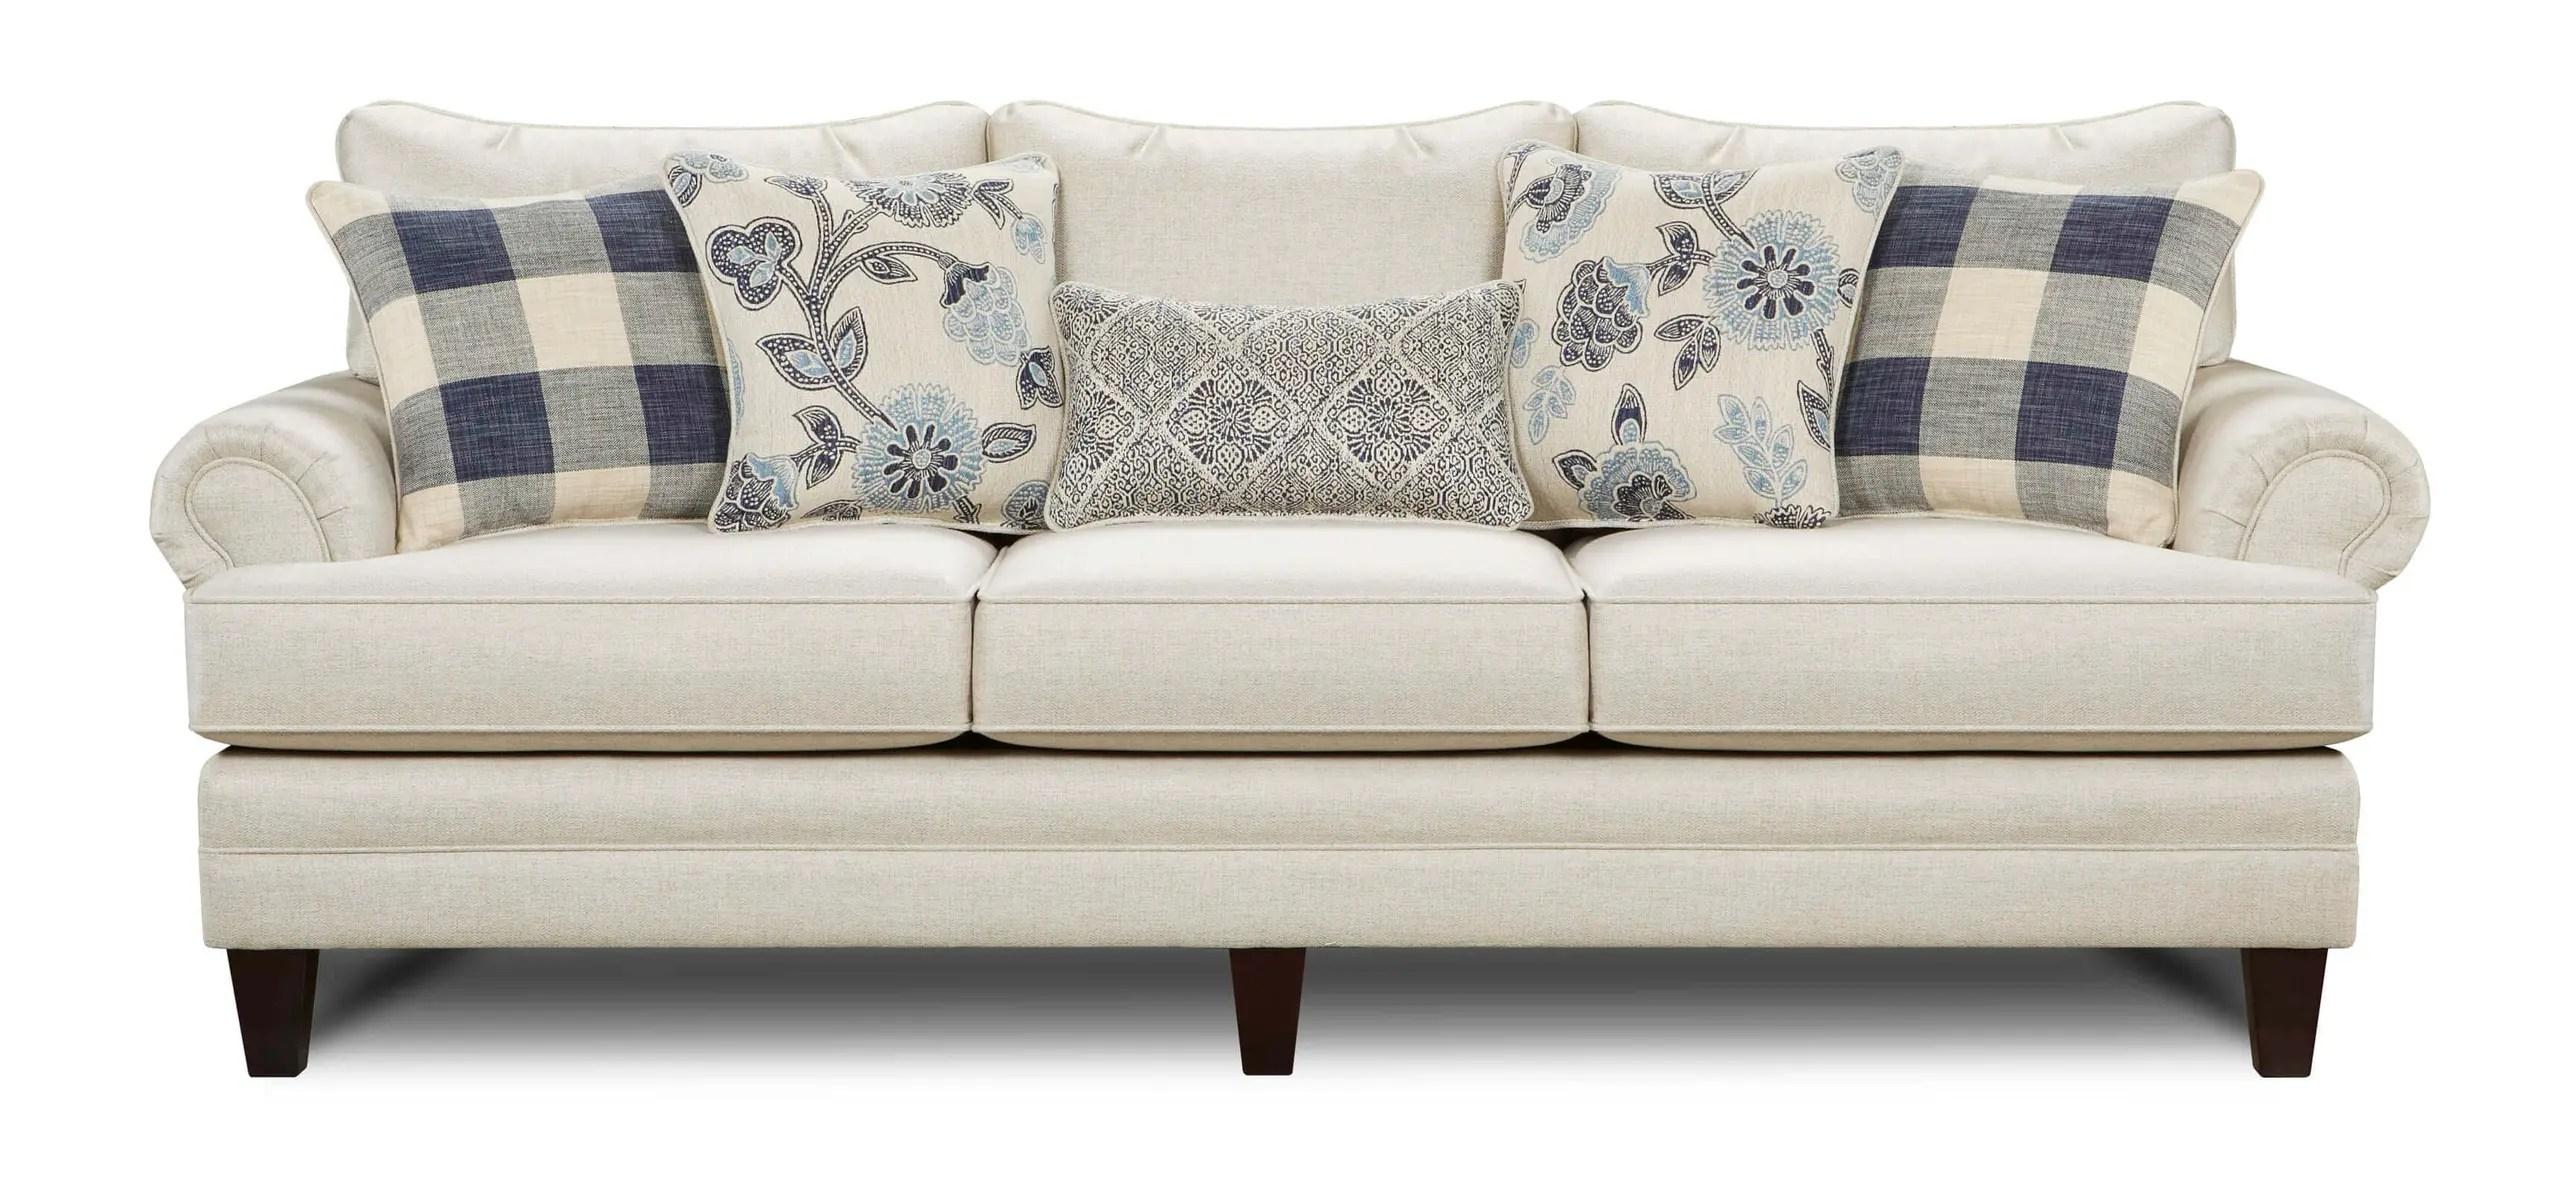 fusion 2810kp catalina linen sofa